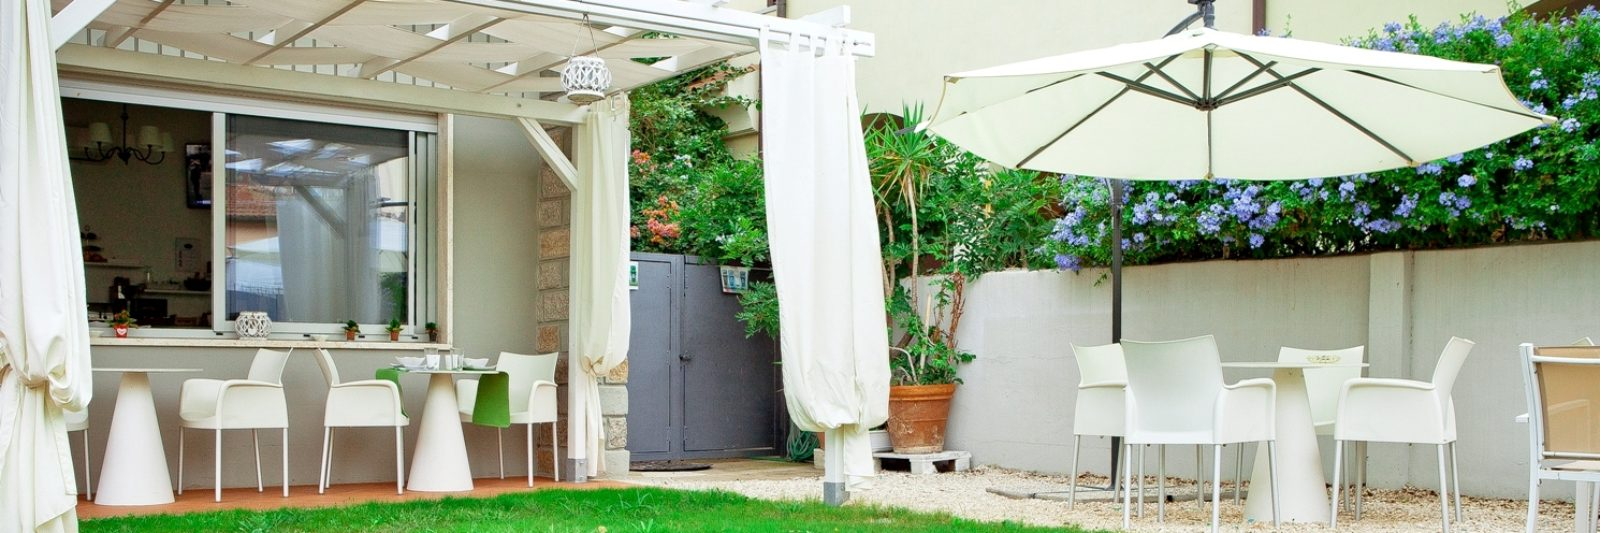 affittacamere city garden olbia